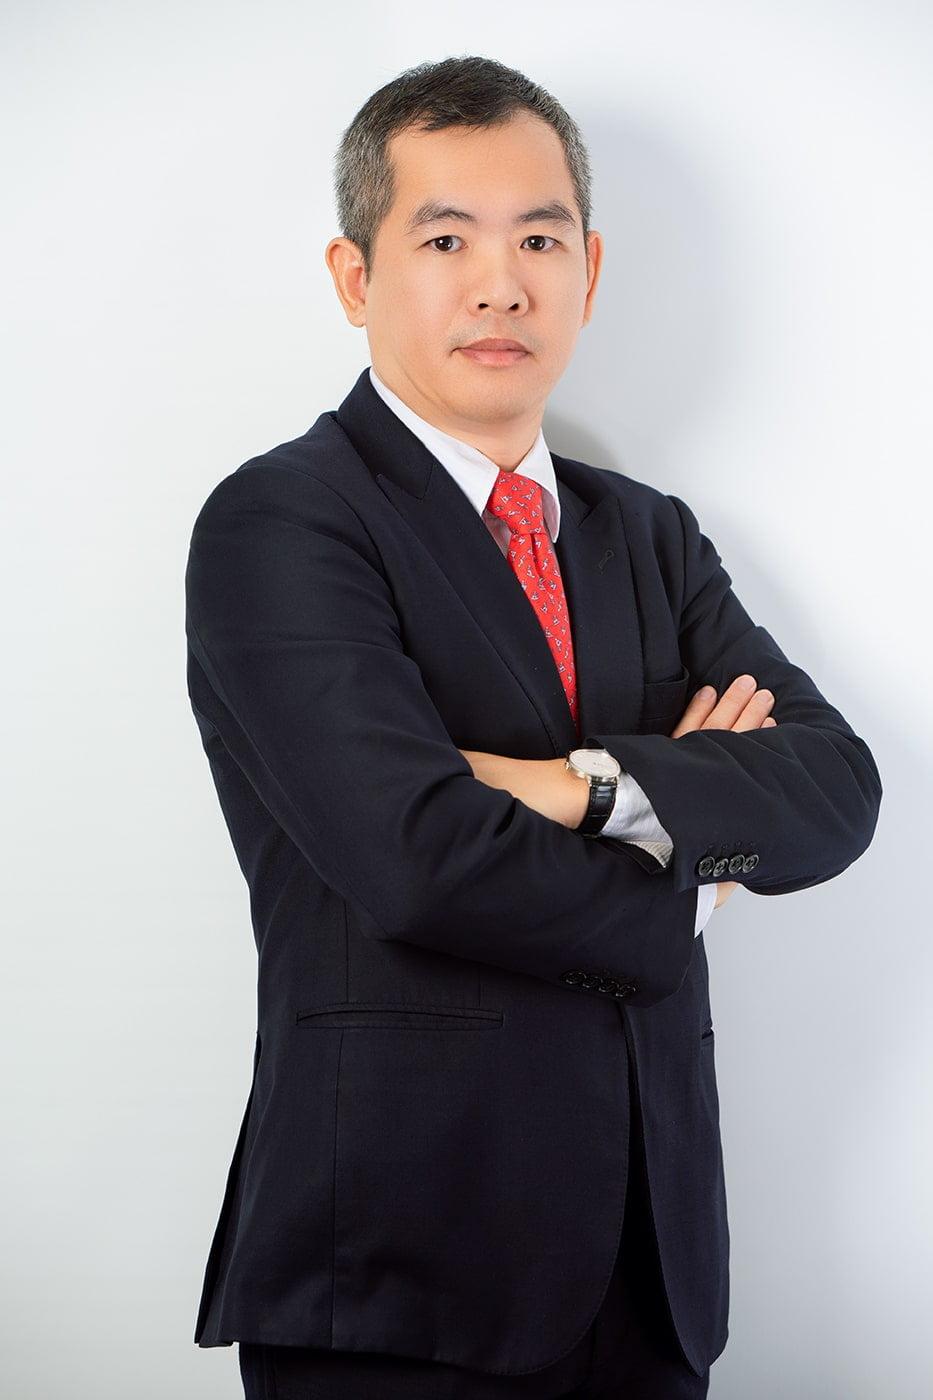 Profile cong ty 10 - Album chụp ảnh profile công ty Luật Dzungsrt Law - HThao Studio